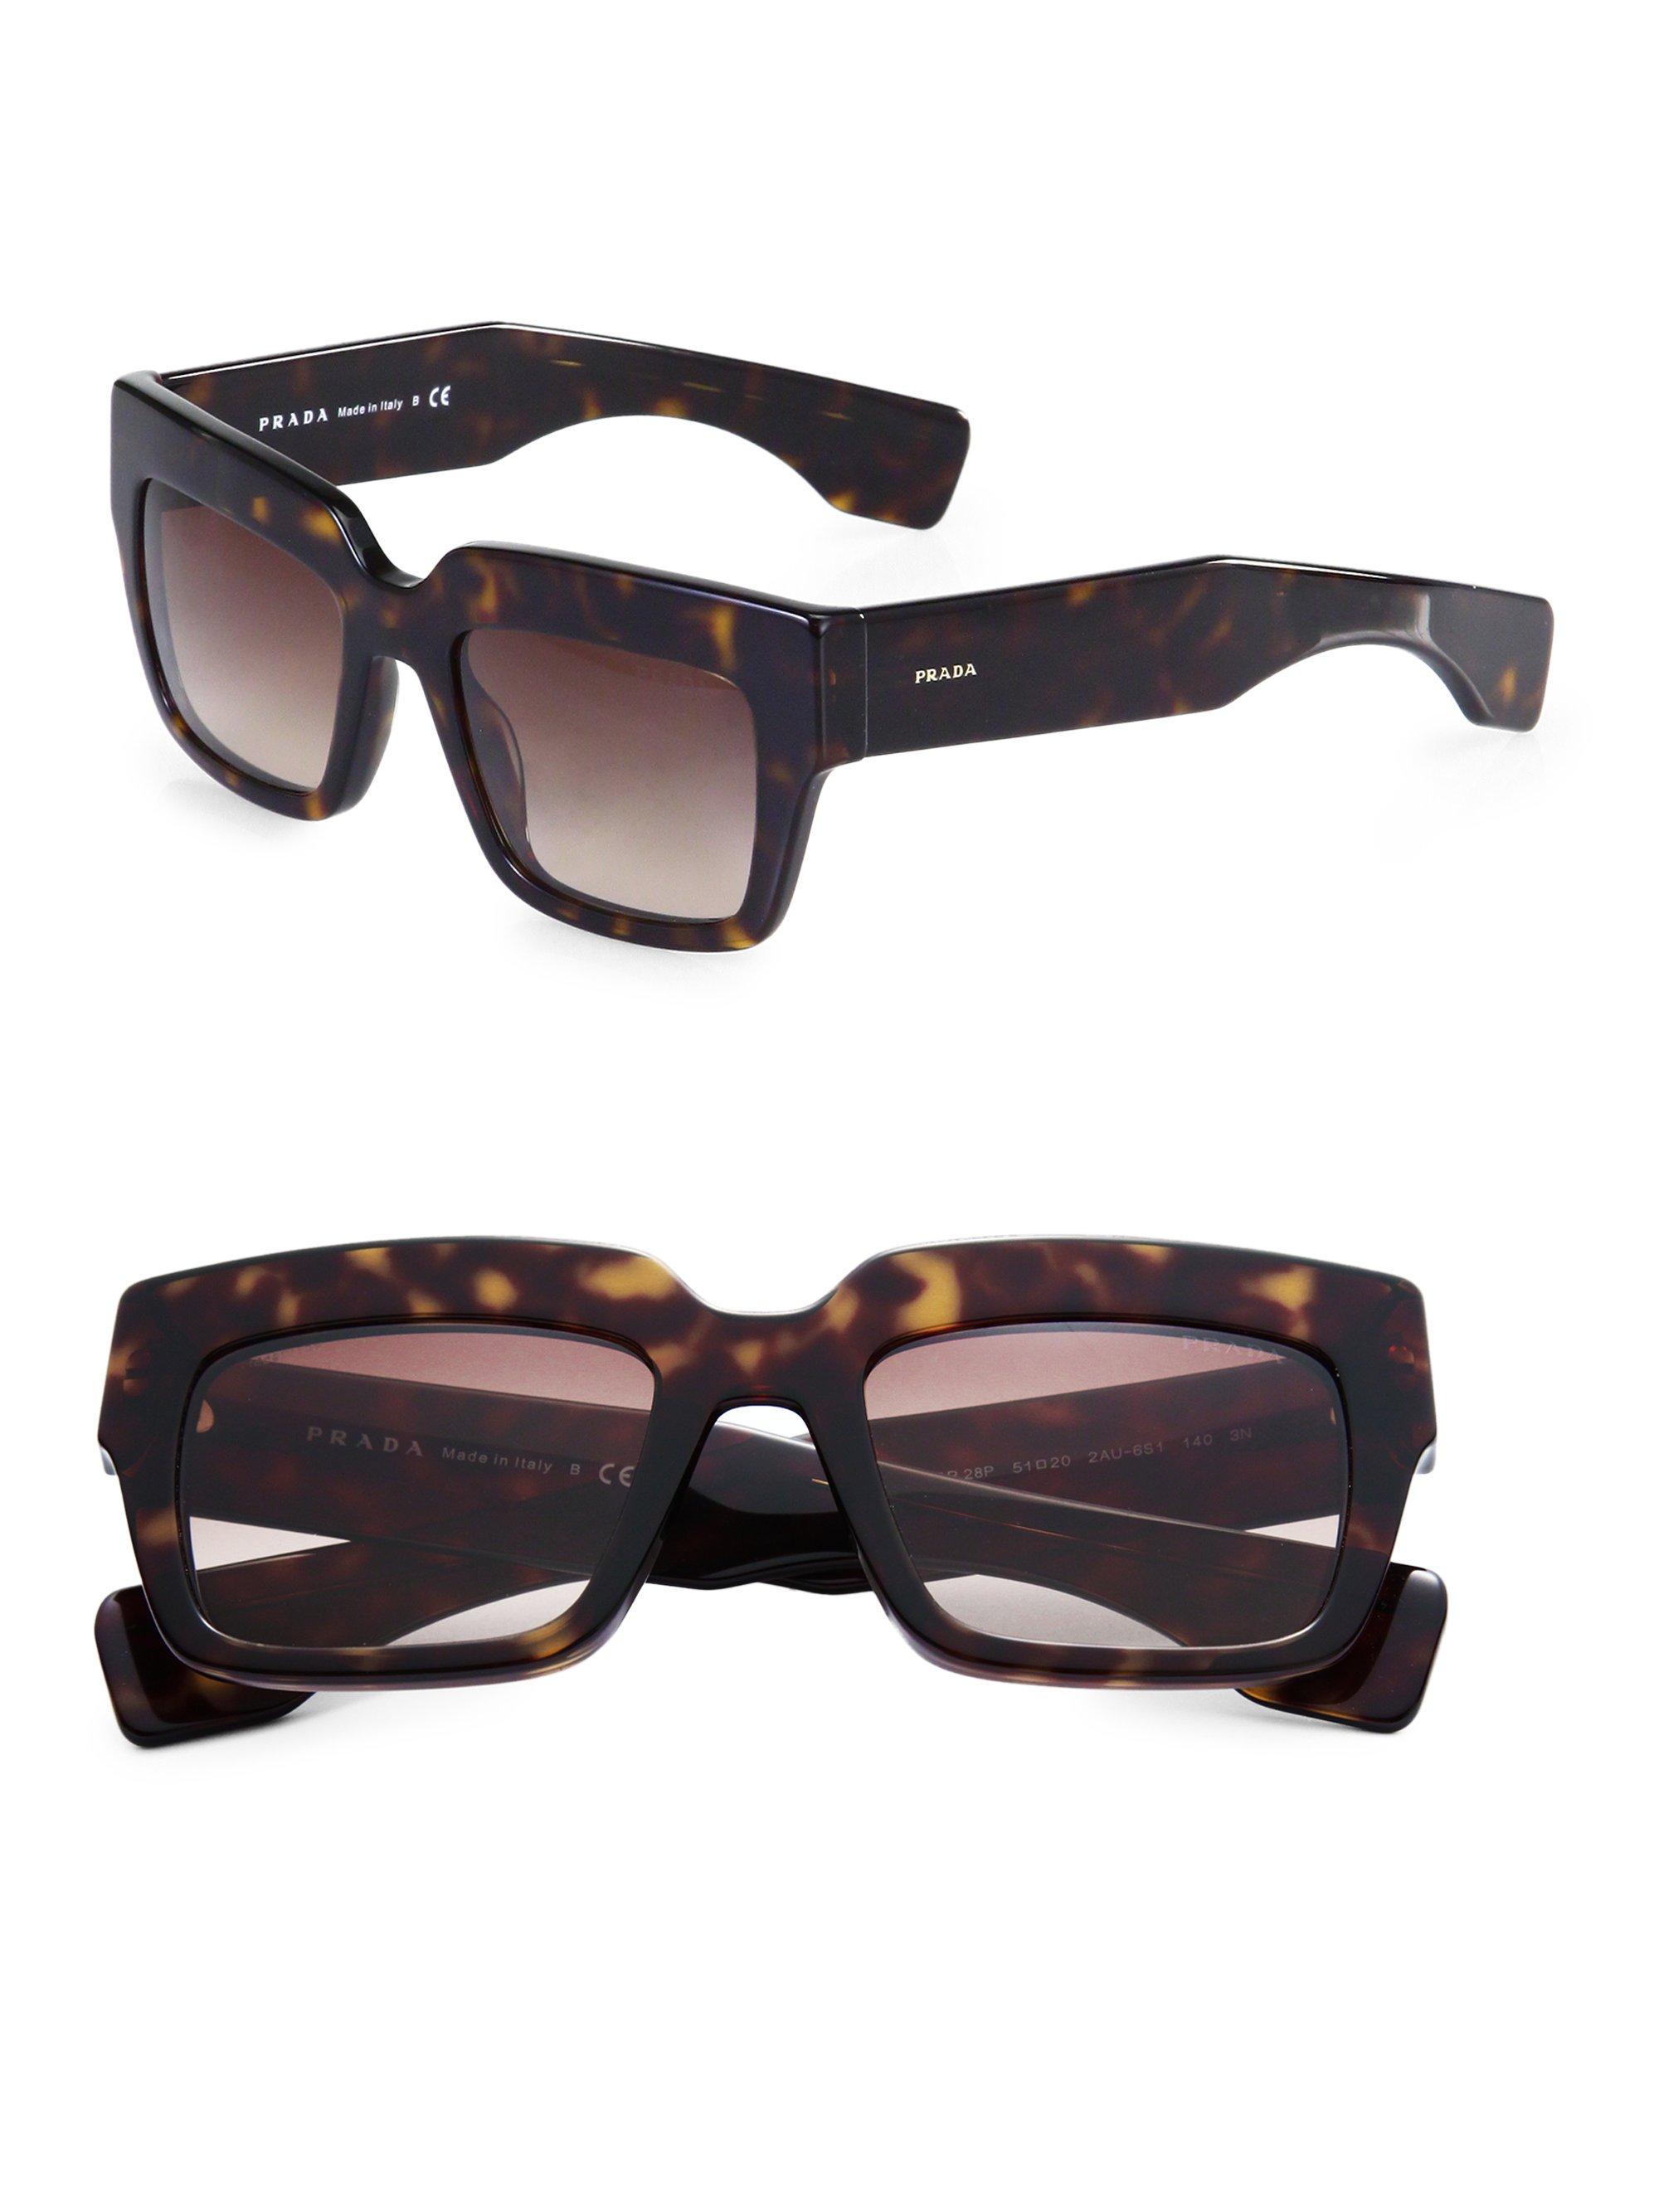 c62f9c7a0e503 Prada Poeme Tortoise-Print Square Sunglasses in Brown - Lyst